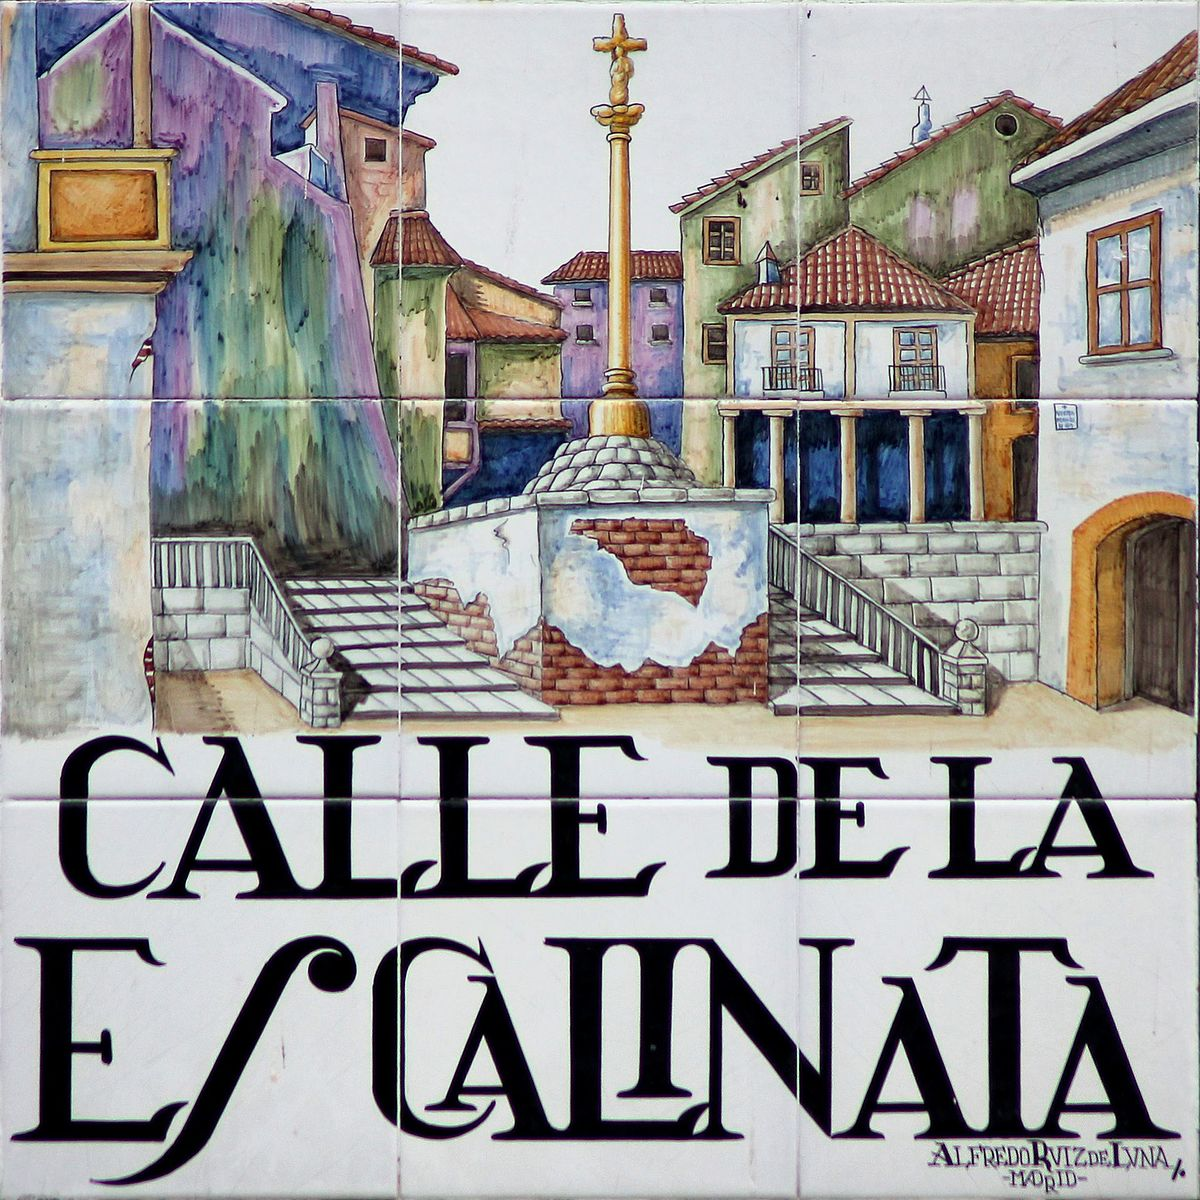 Calle de la Escalinata  Wikipedia la enciclopedia libre